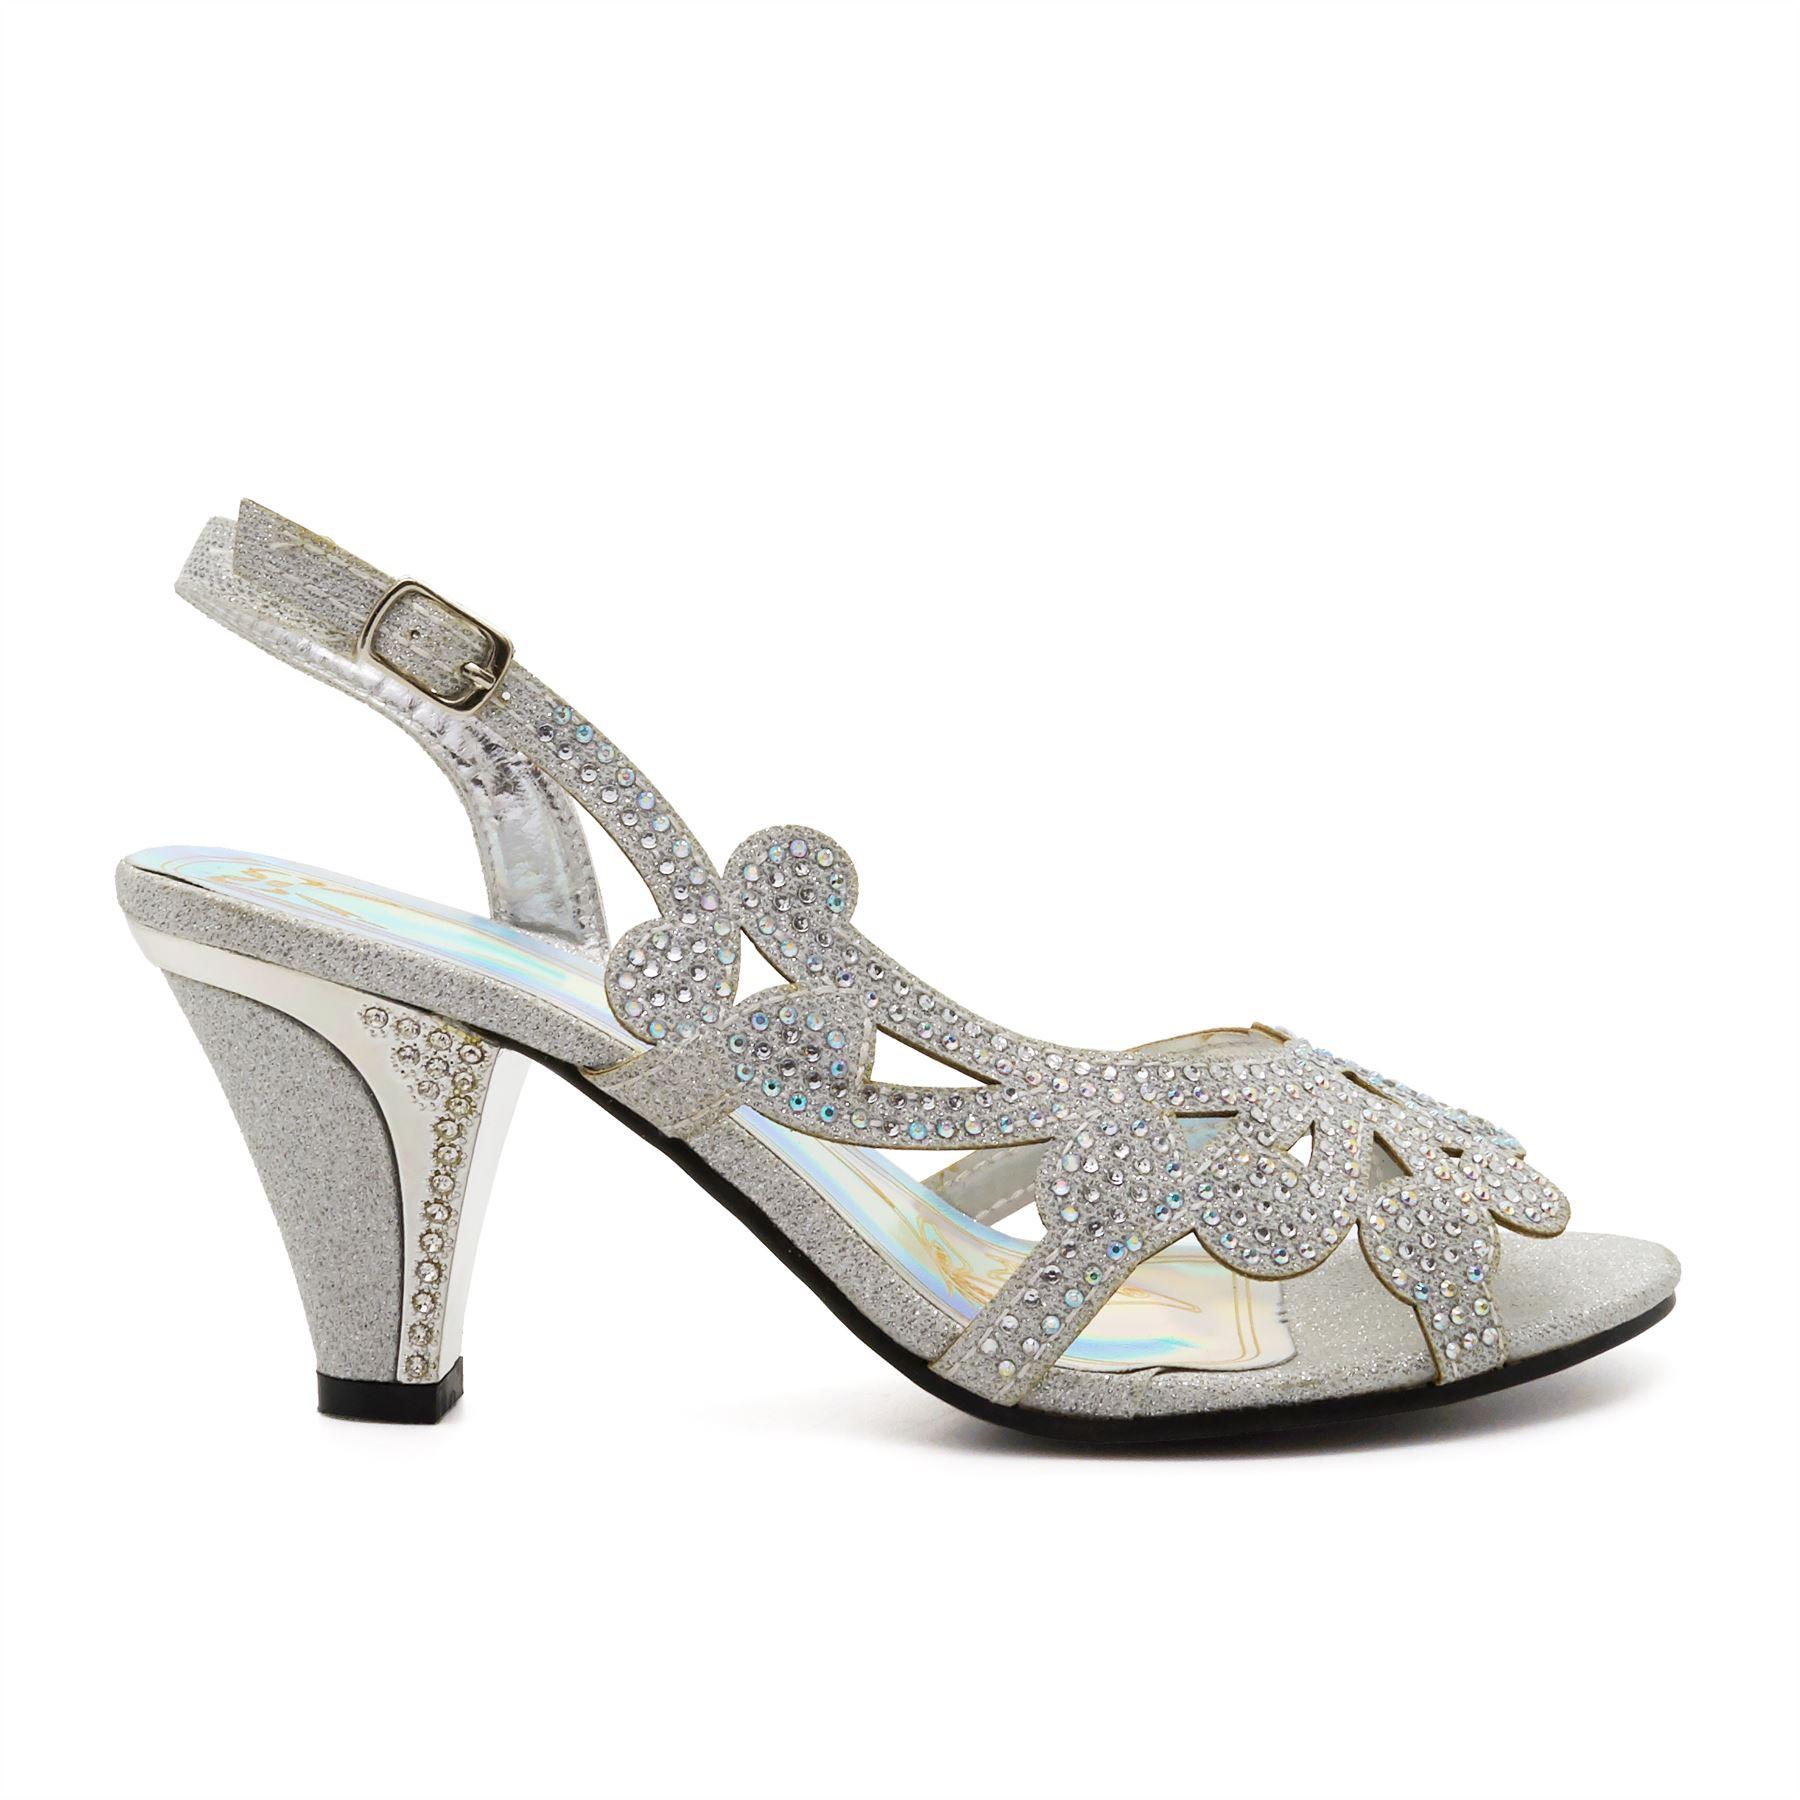 c41c57f1dd2 New Ladies Low Mid Kitten Heel Diamante Sandals Womens Bridal ...